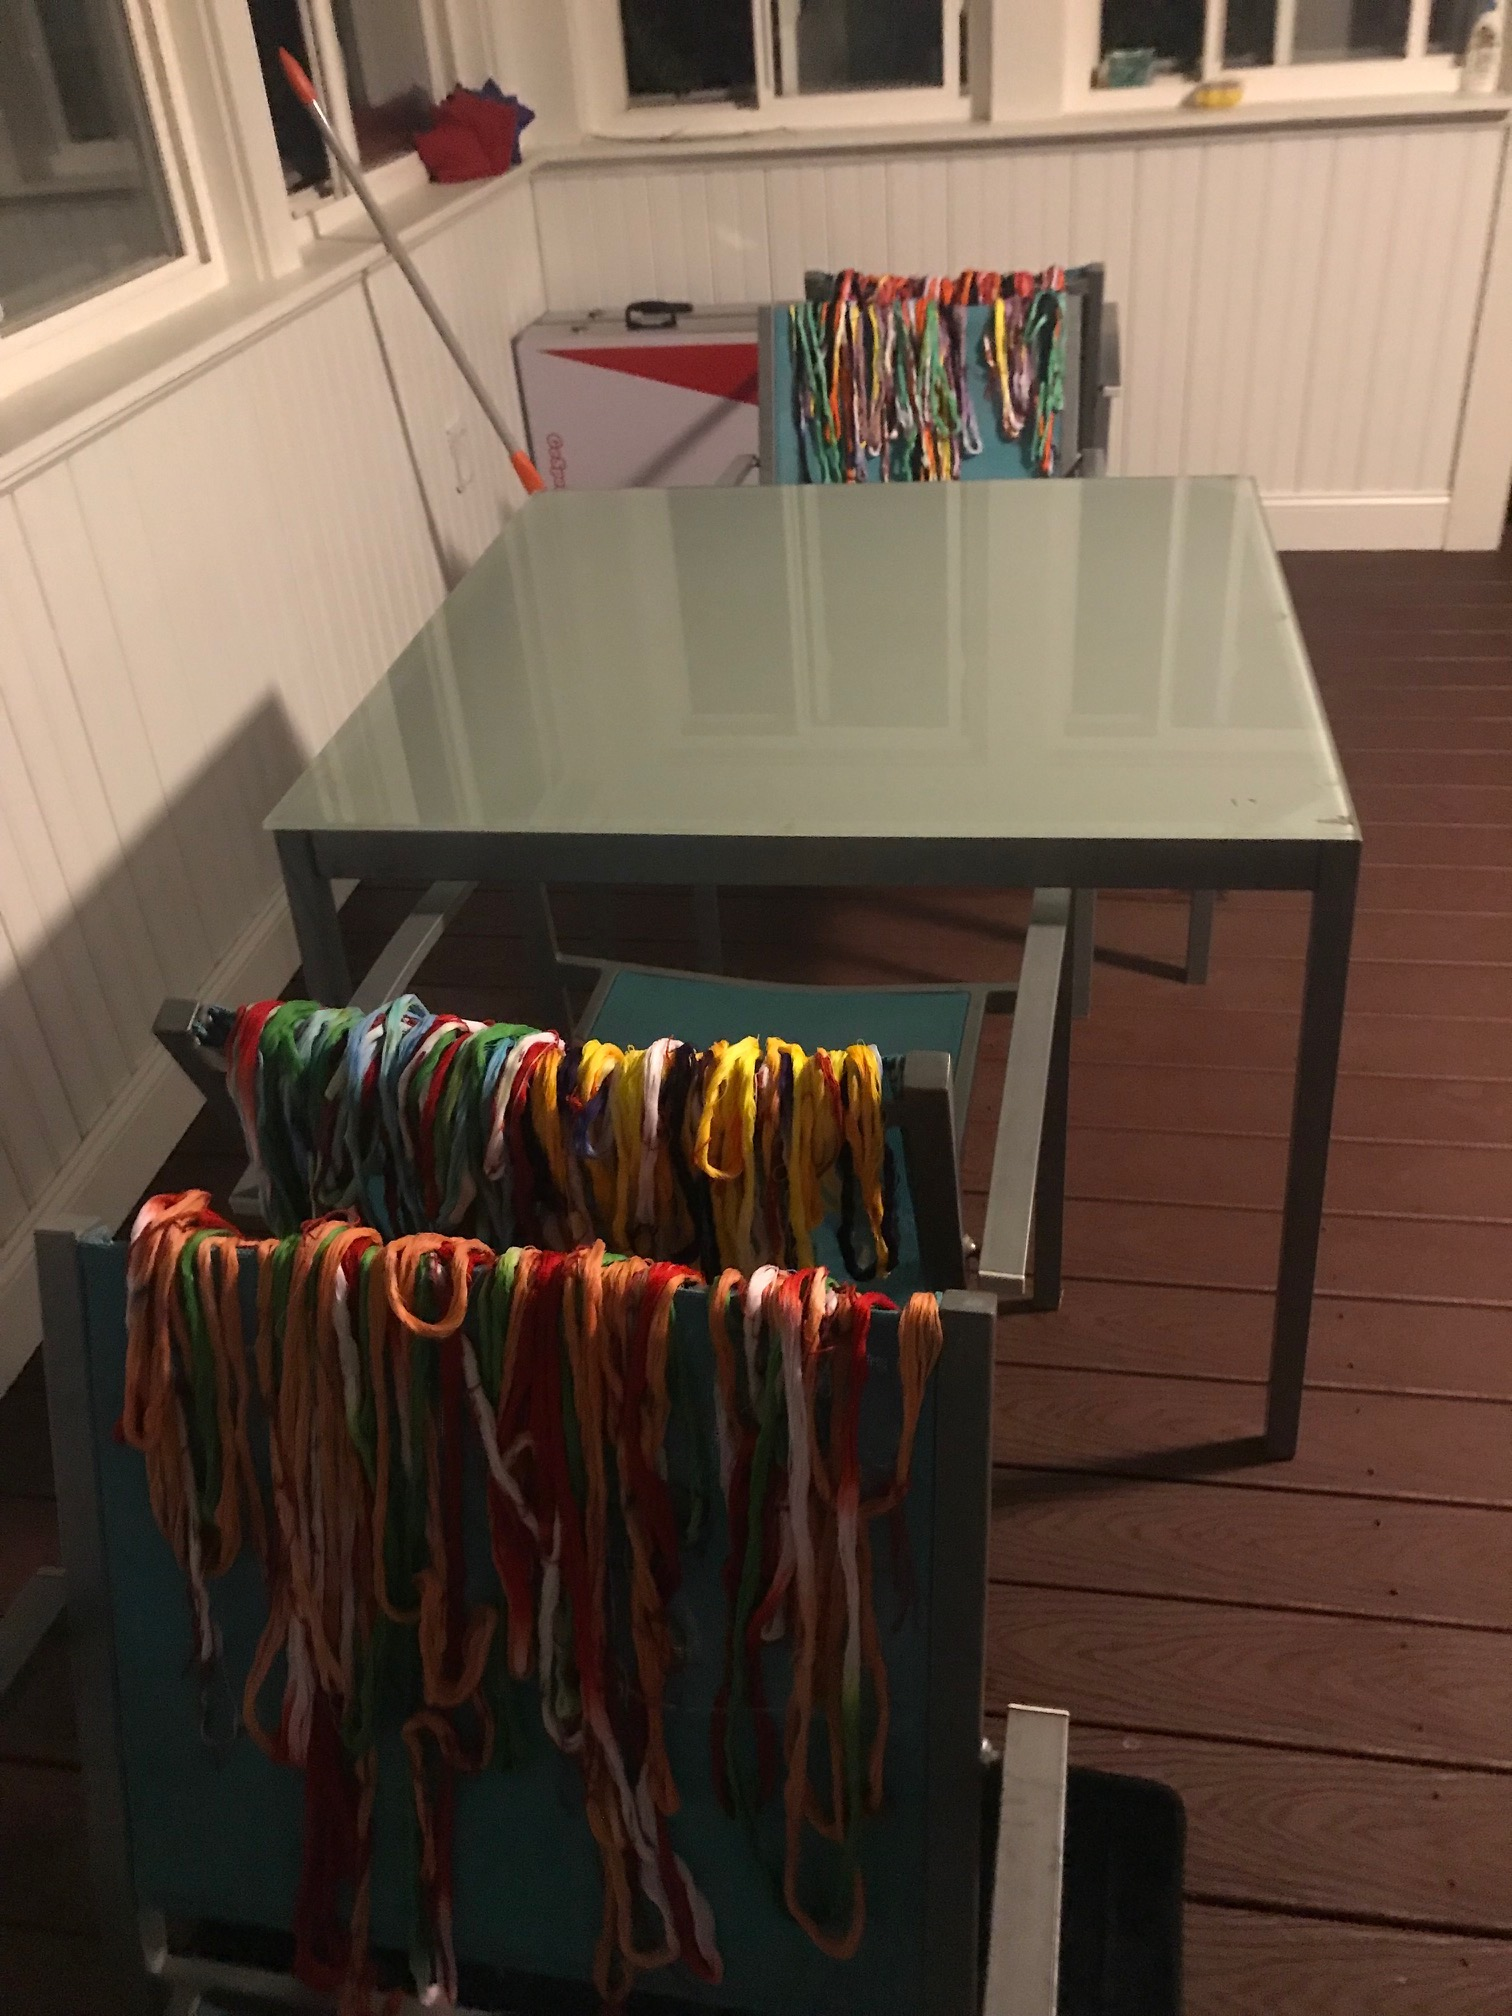 drying warps.jpg